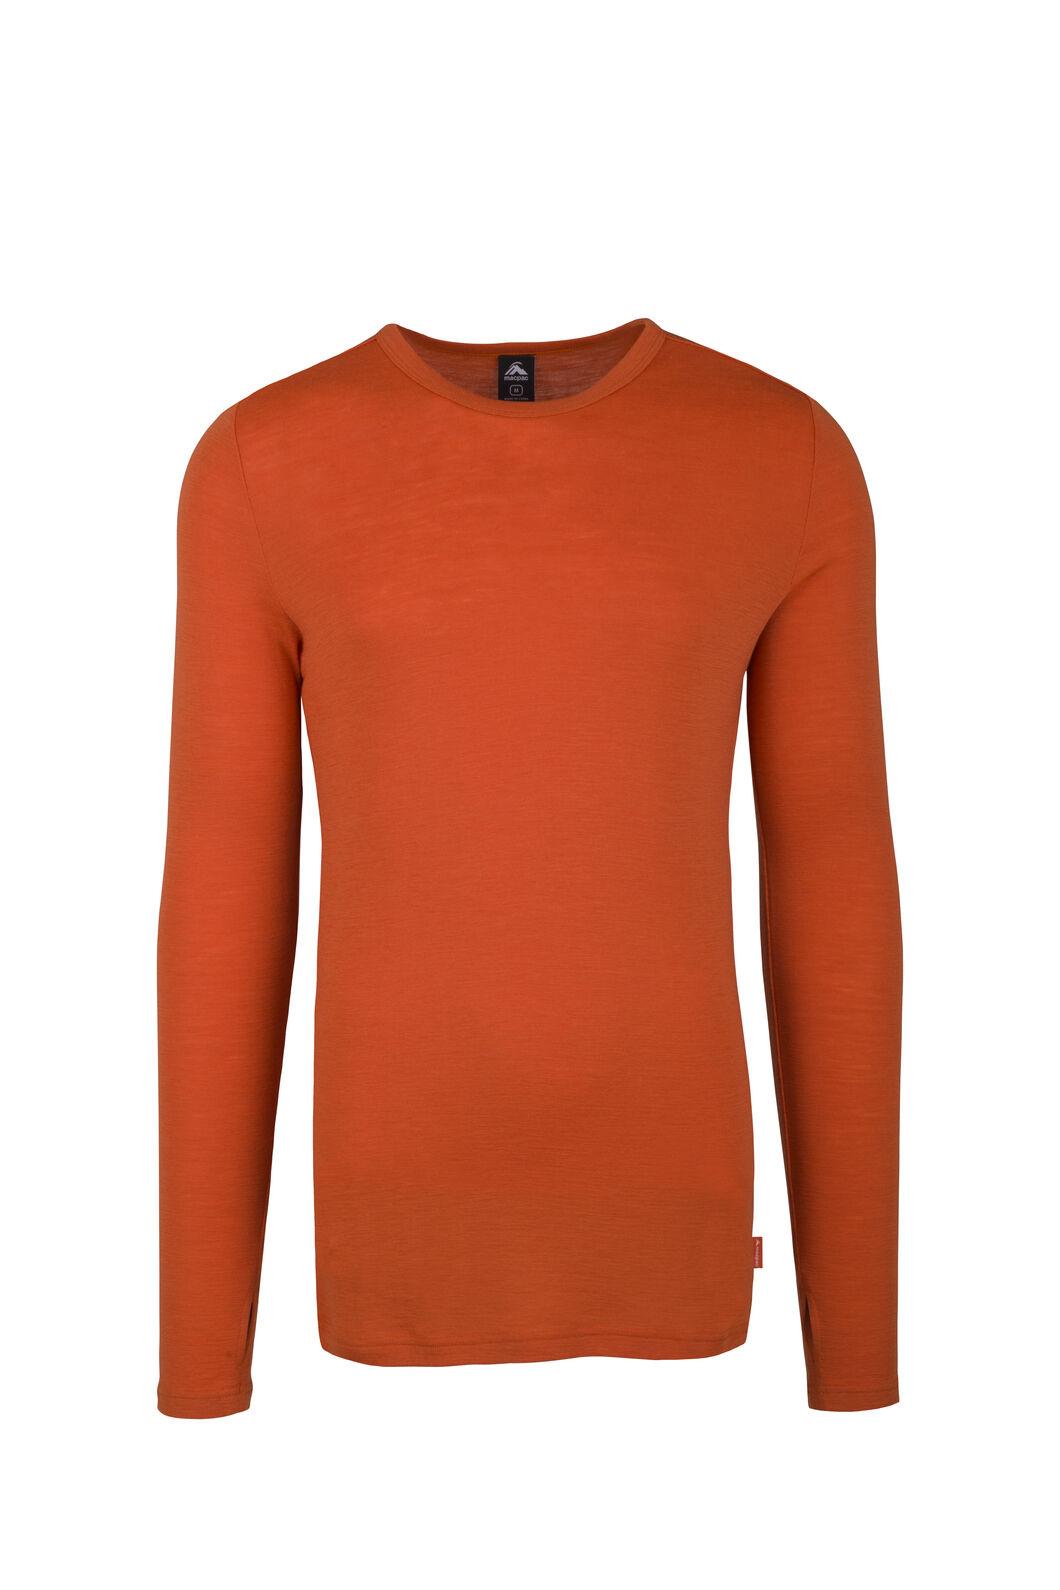 Macpac Men's 220 Merino Long Sleeve Top, Burnt Orange, hi-res